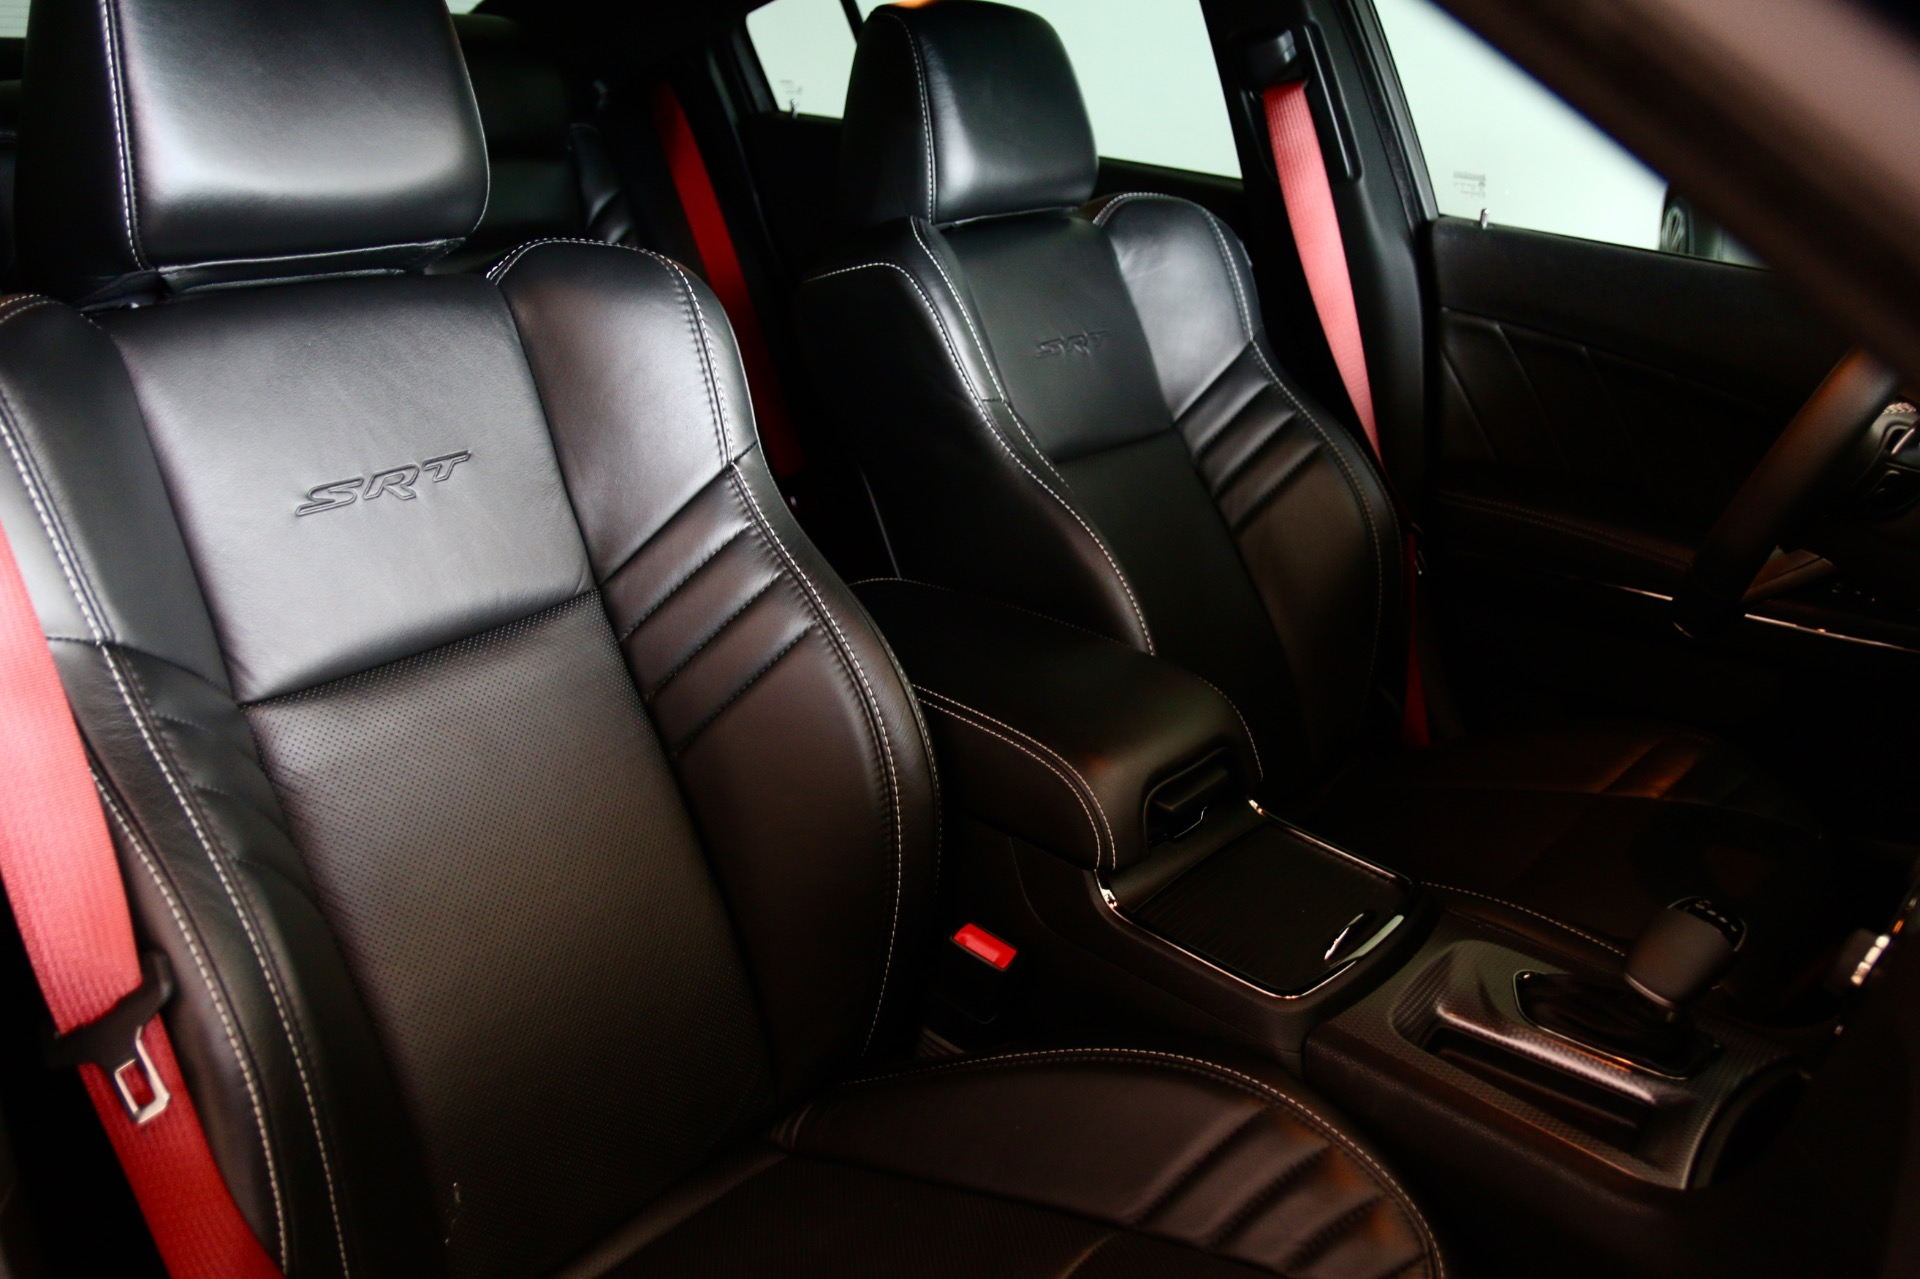 2016 Dodge Charger Srt Hellcat Stock 7n065314a For Sale Near Vienna Va Va Dodge Dealer